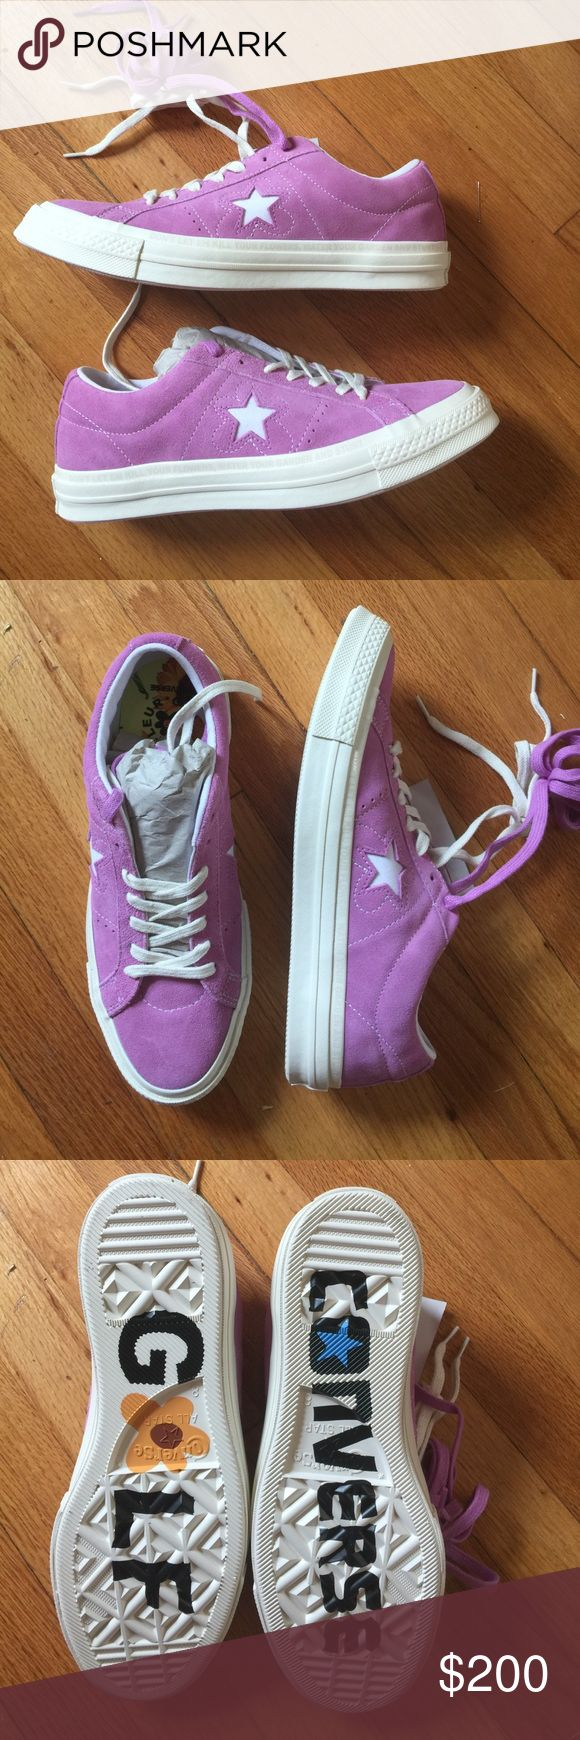 Converse tyler the creator golf Le fleur 100% Deadstock in box. Men's size 8= women's 10 Converse Shoes Sneakers